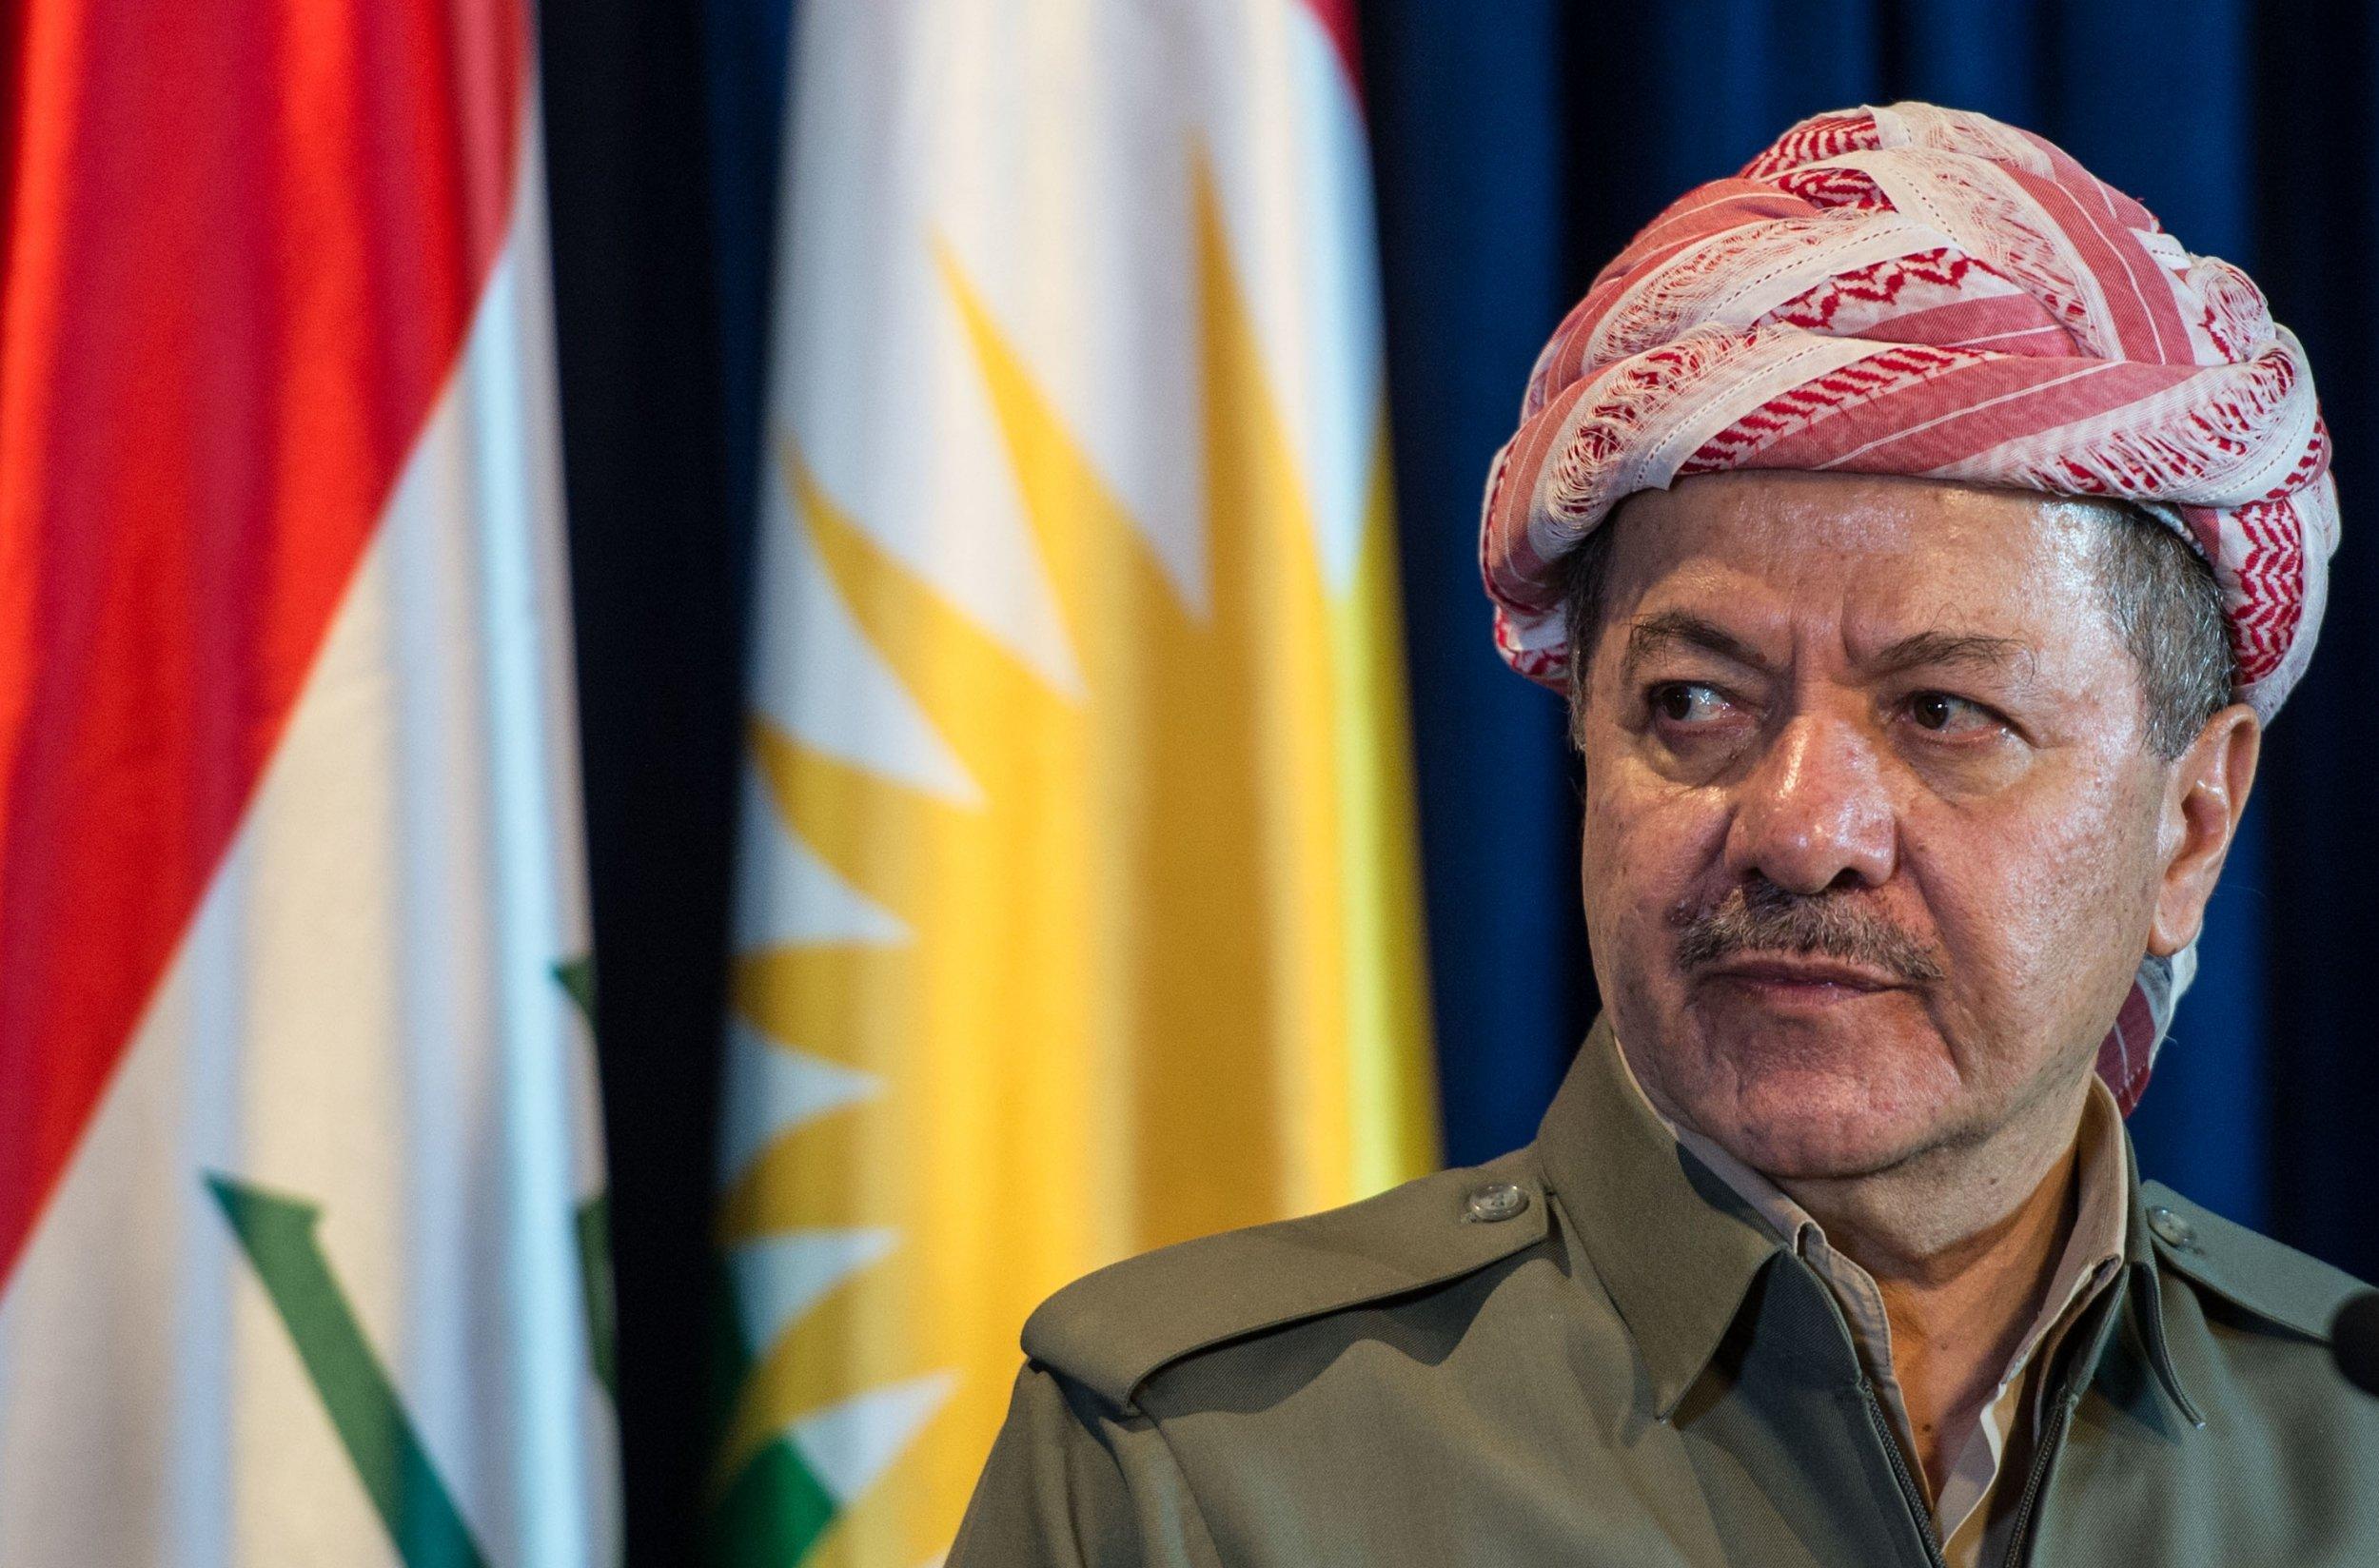 05_24_Kurd_Leader_01